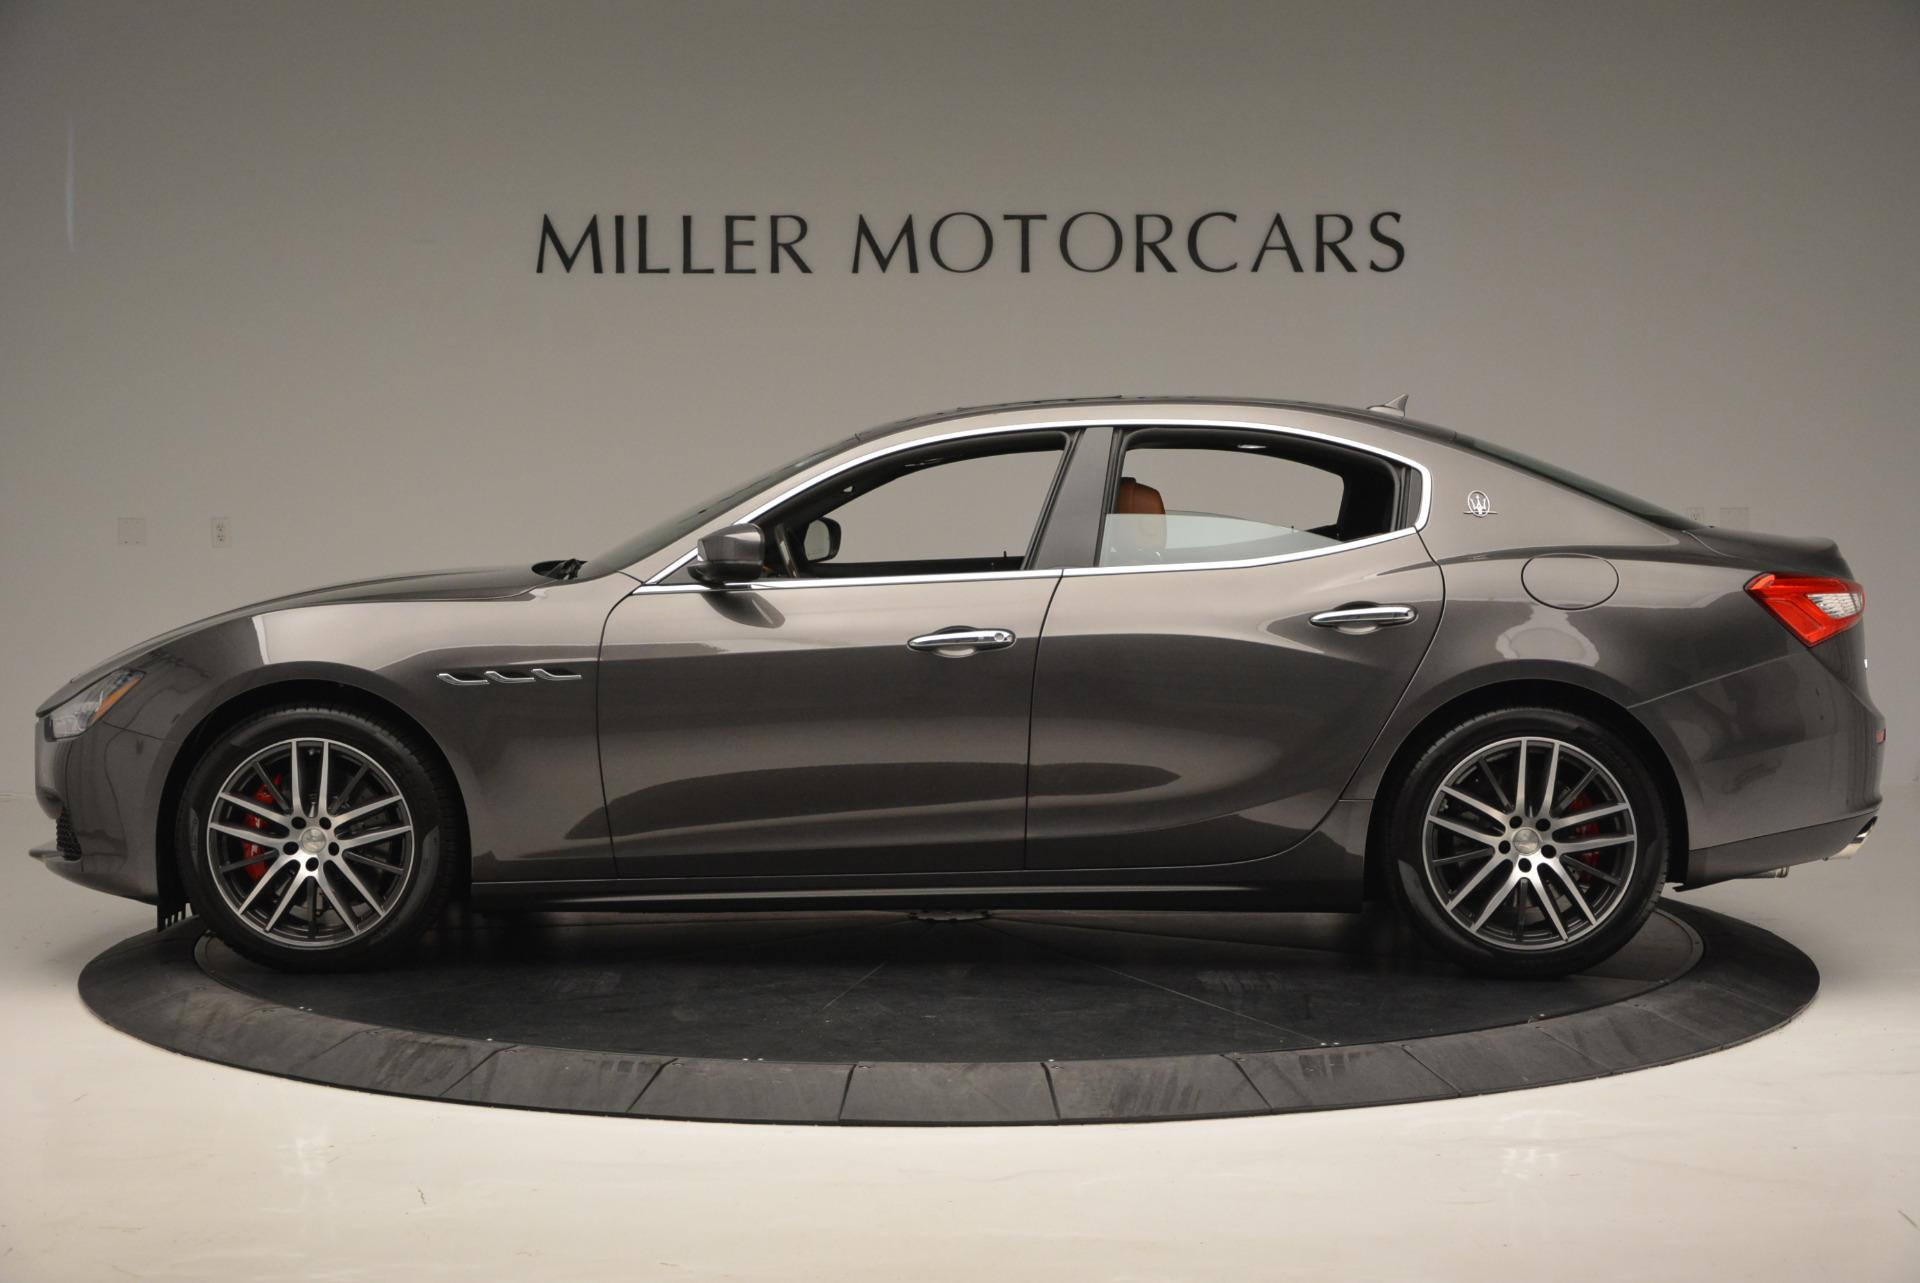 Used 2017 Maserati Ghibli S Q4  EX-LOANER For Sale In Westport, CT 565_p3